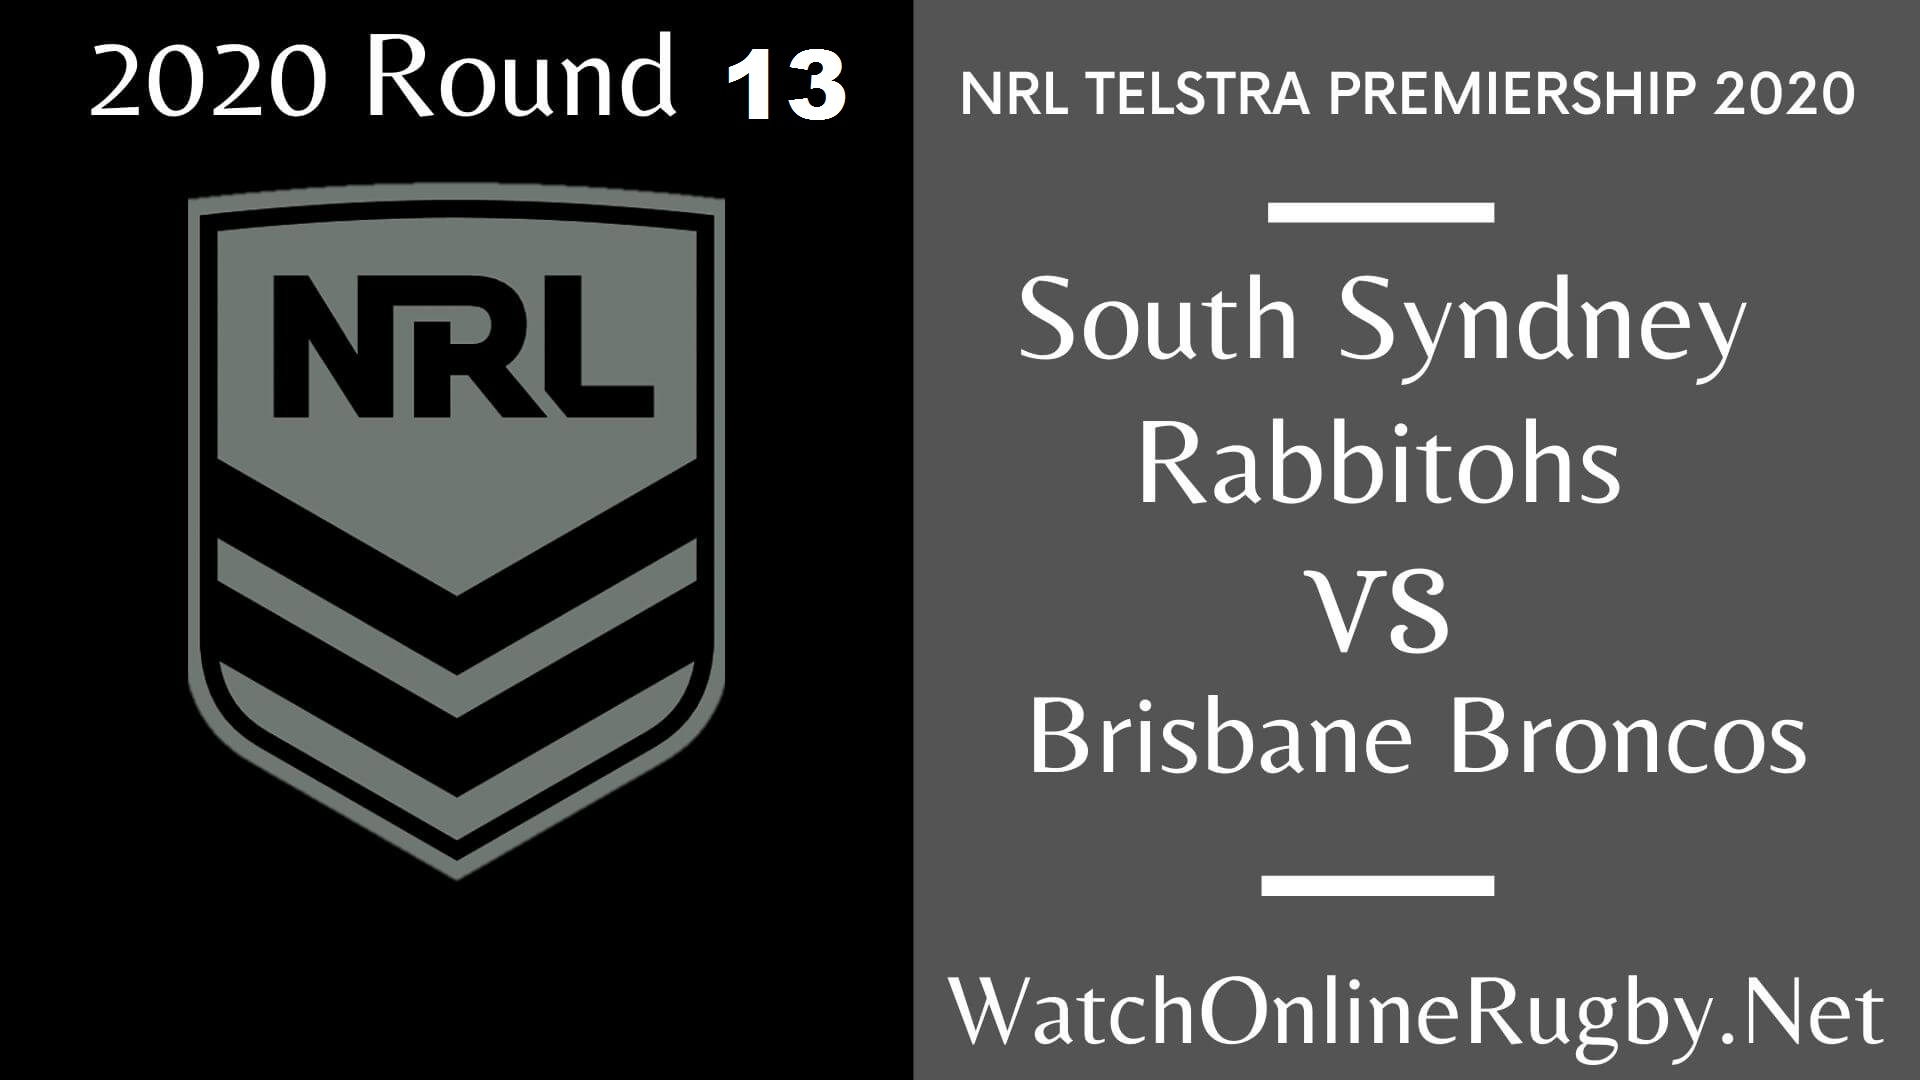 Broncos VS Rabbitohs Live Streaming